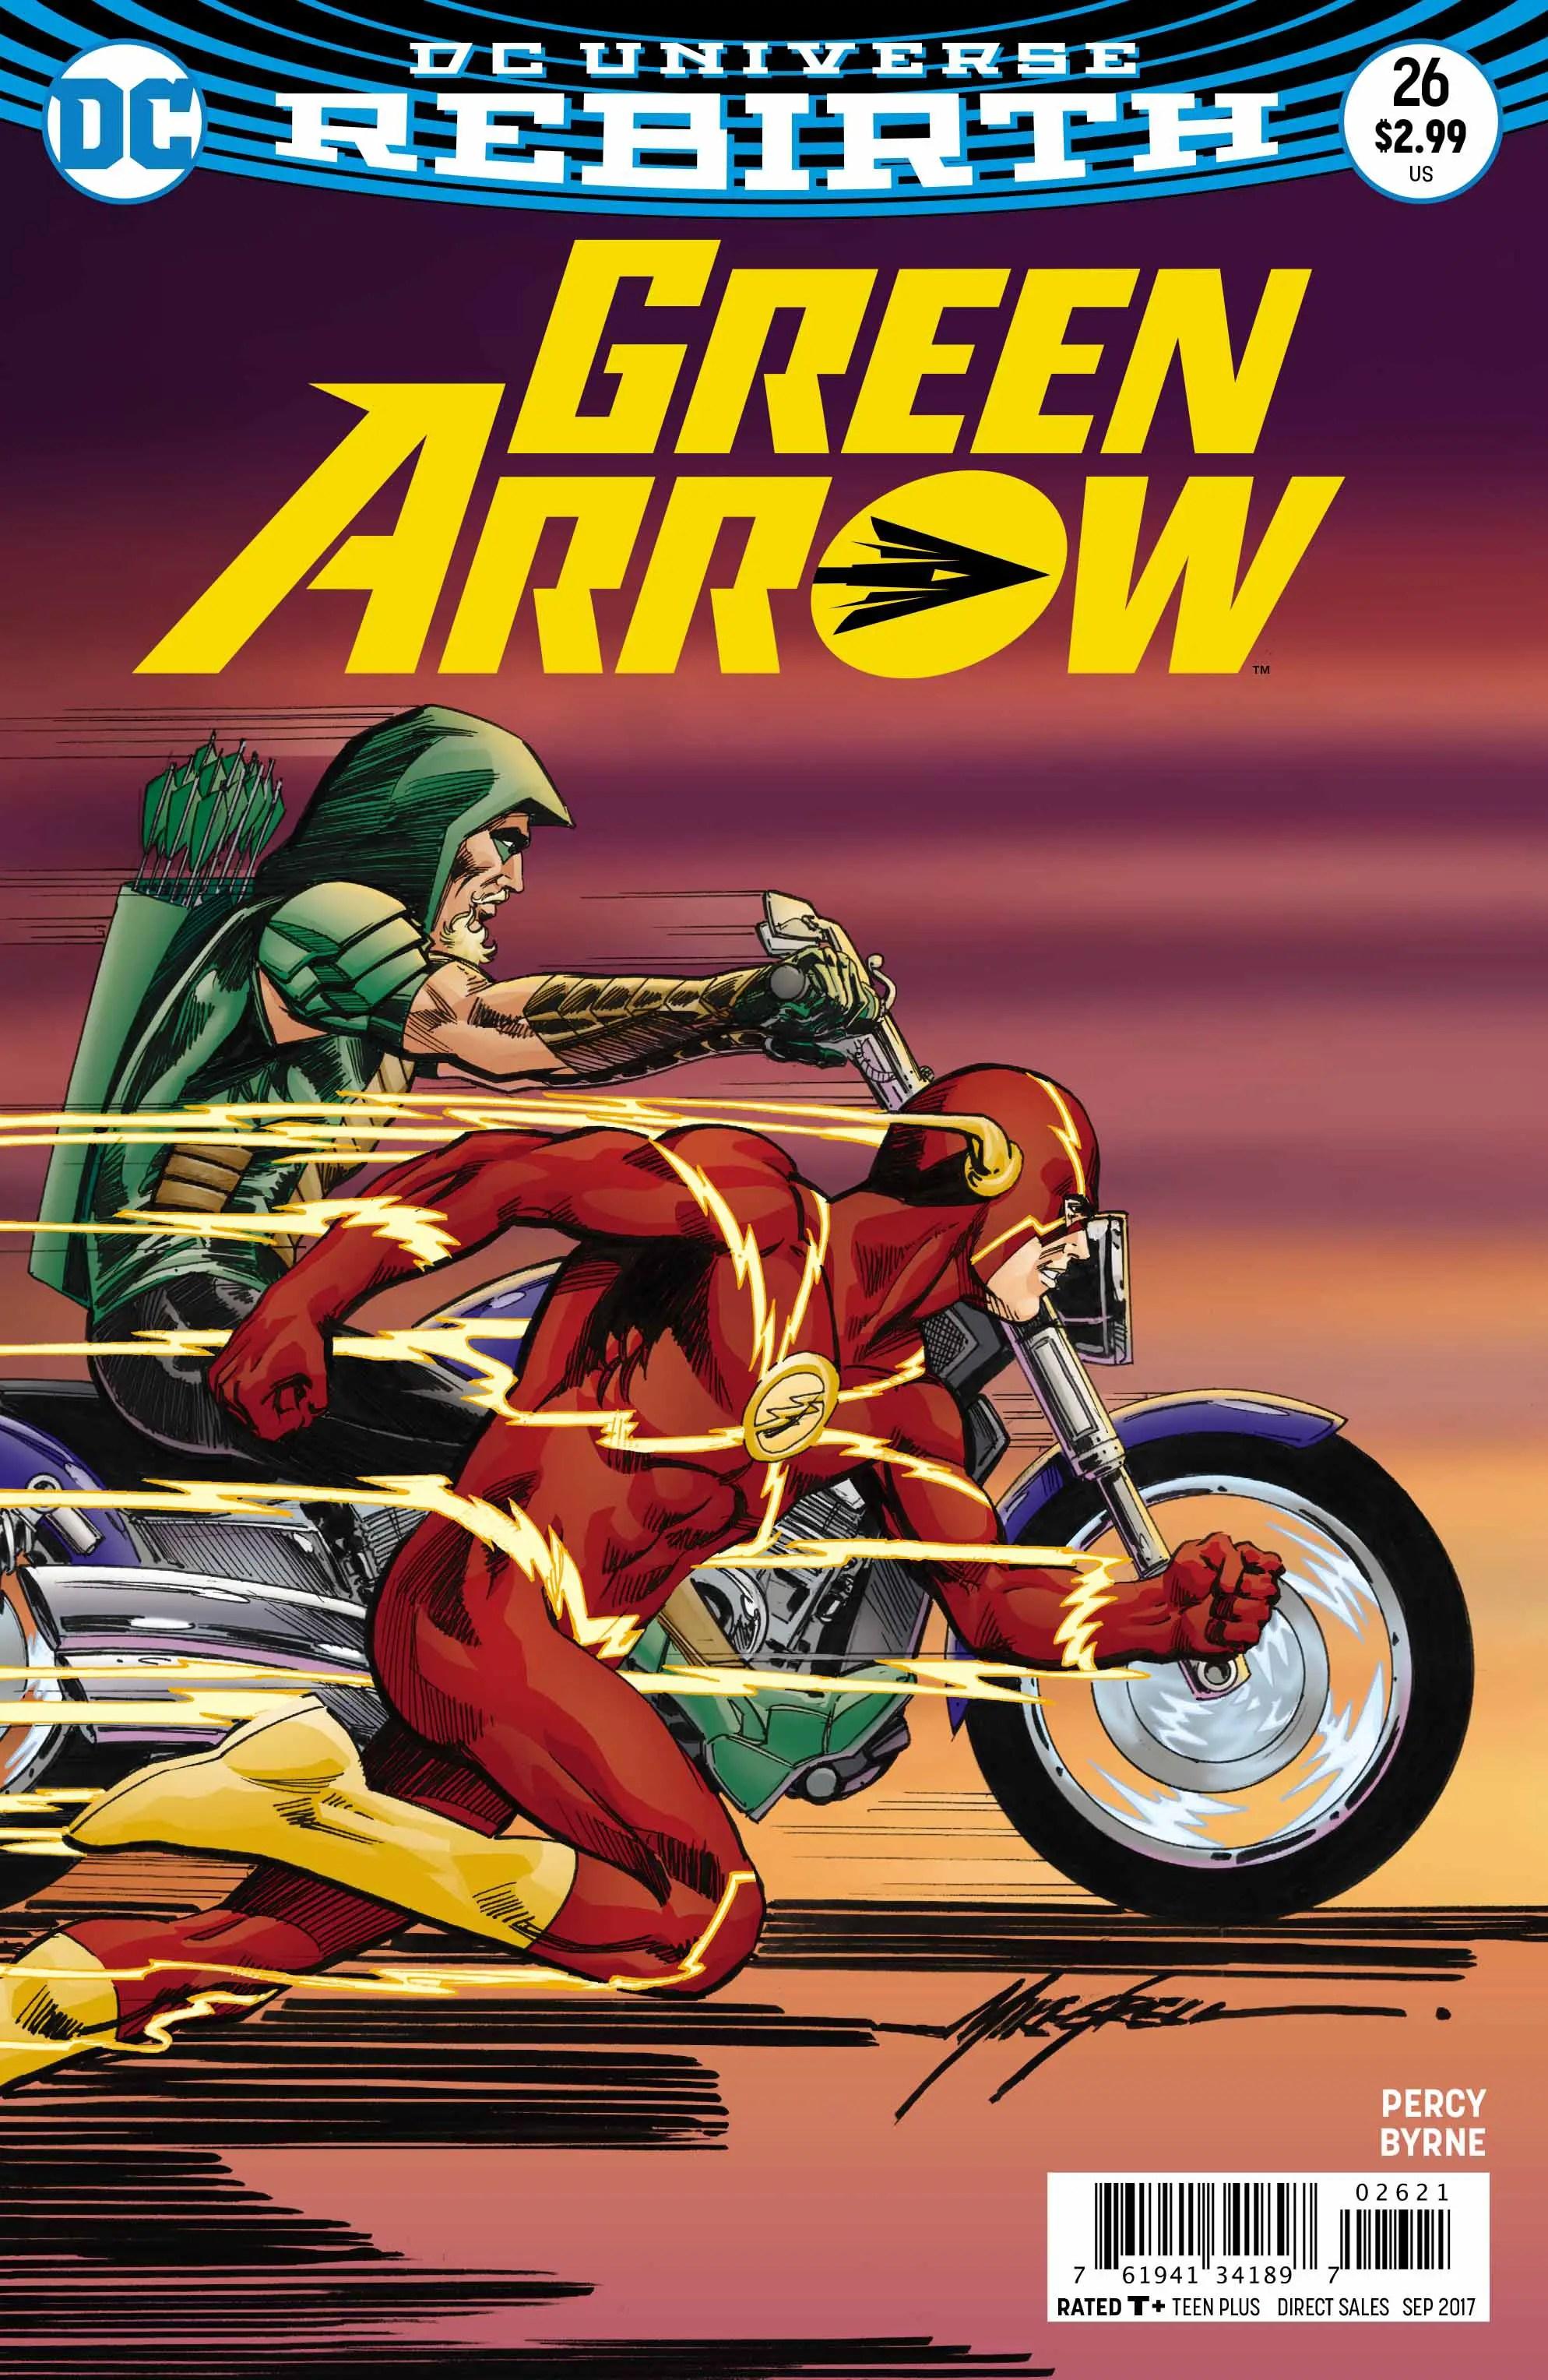 Green Arrow #26 review